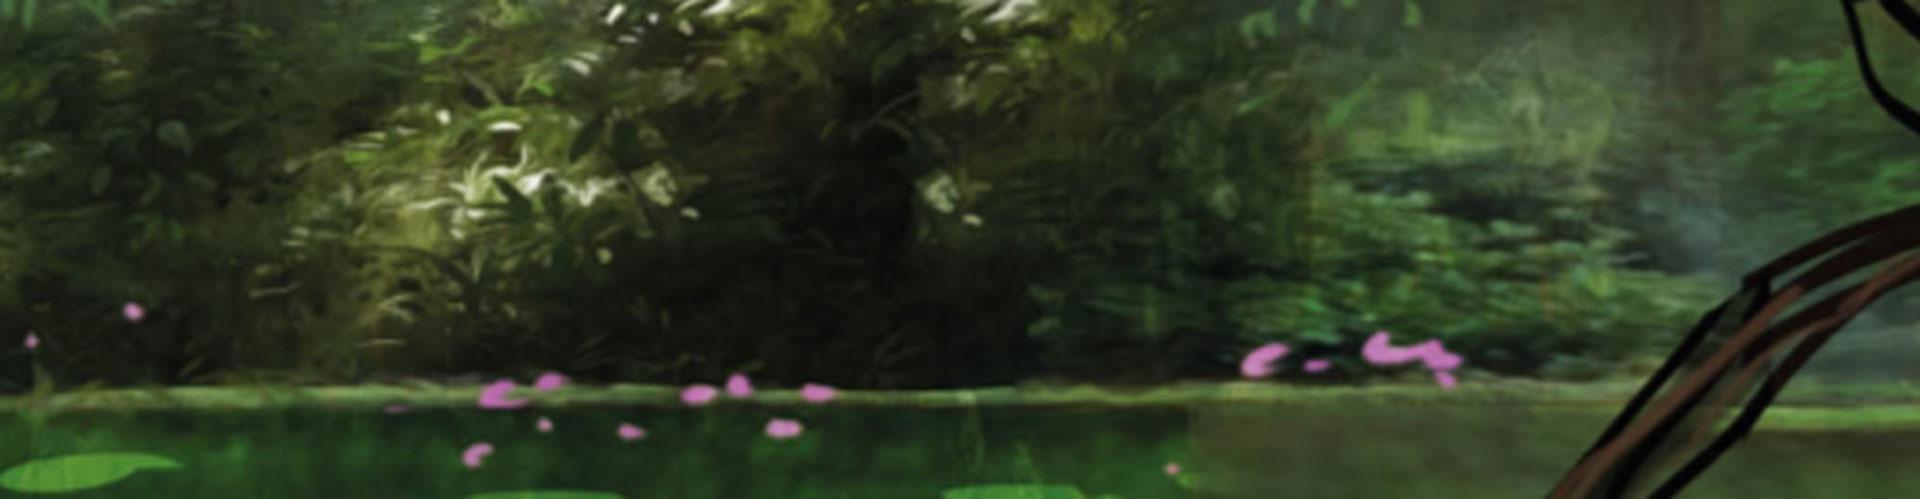 De-tempeljagers-1_Michael-Reefs